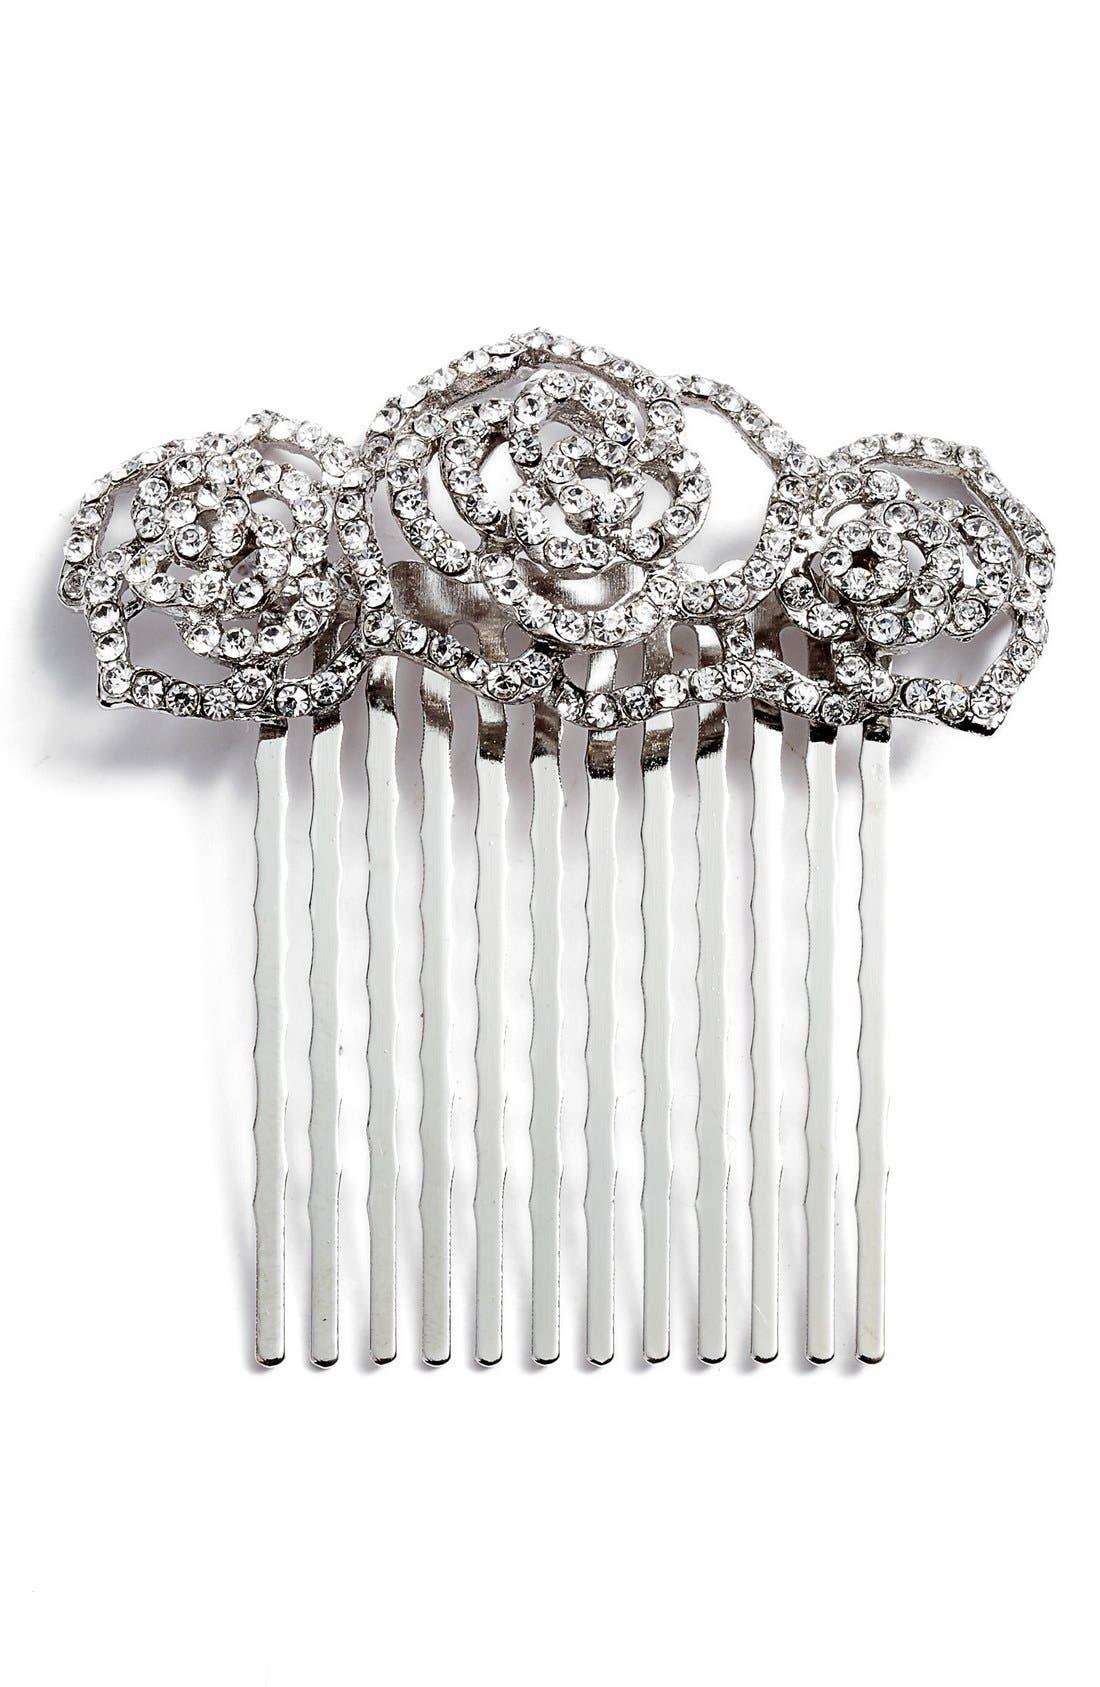 Main Image - Tasha Rosie Posie Crystal Comb